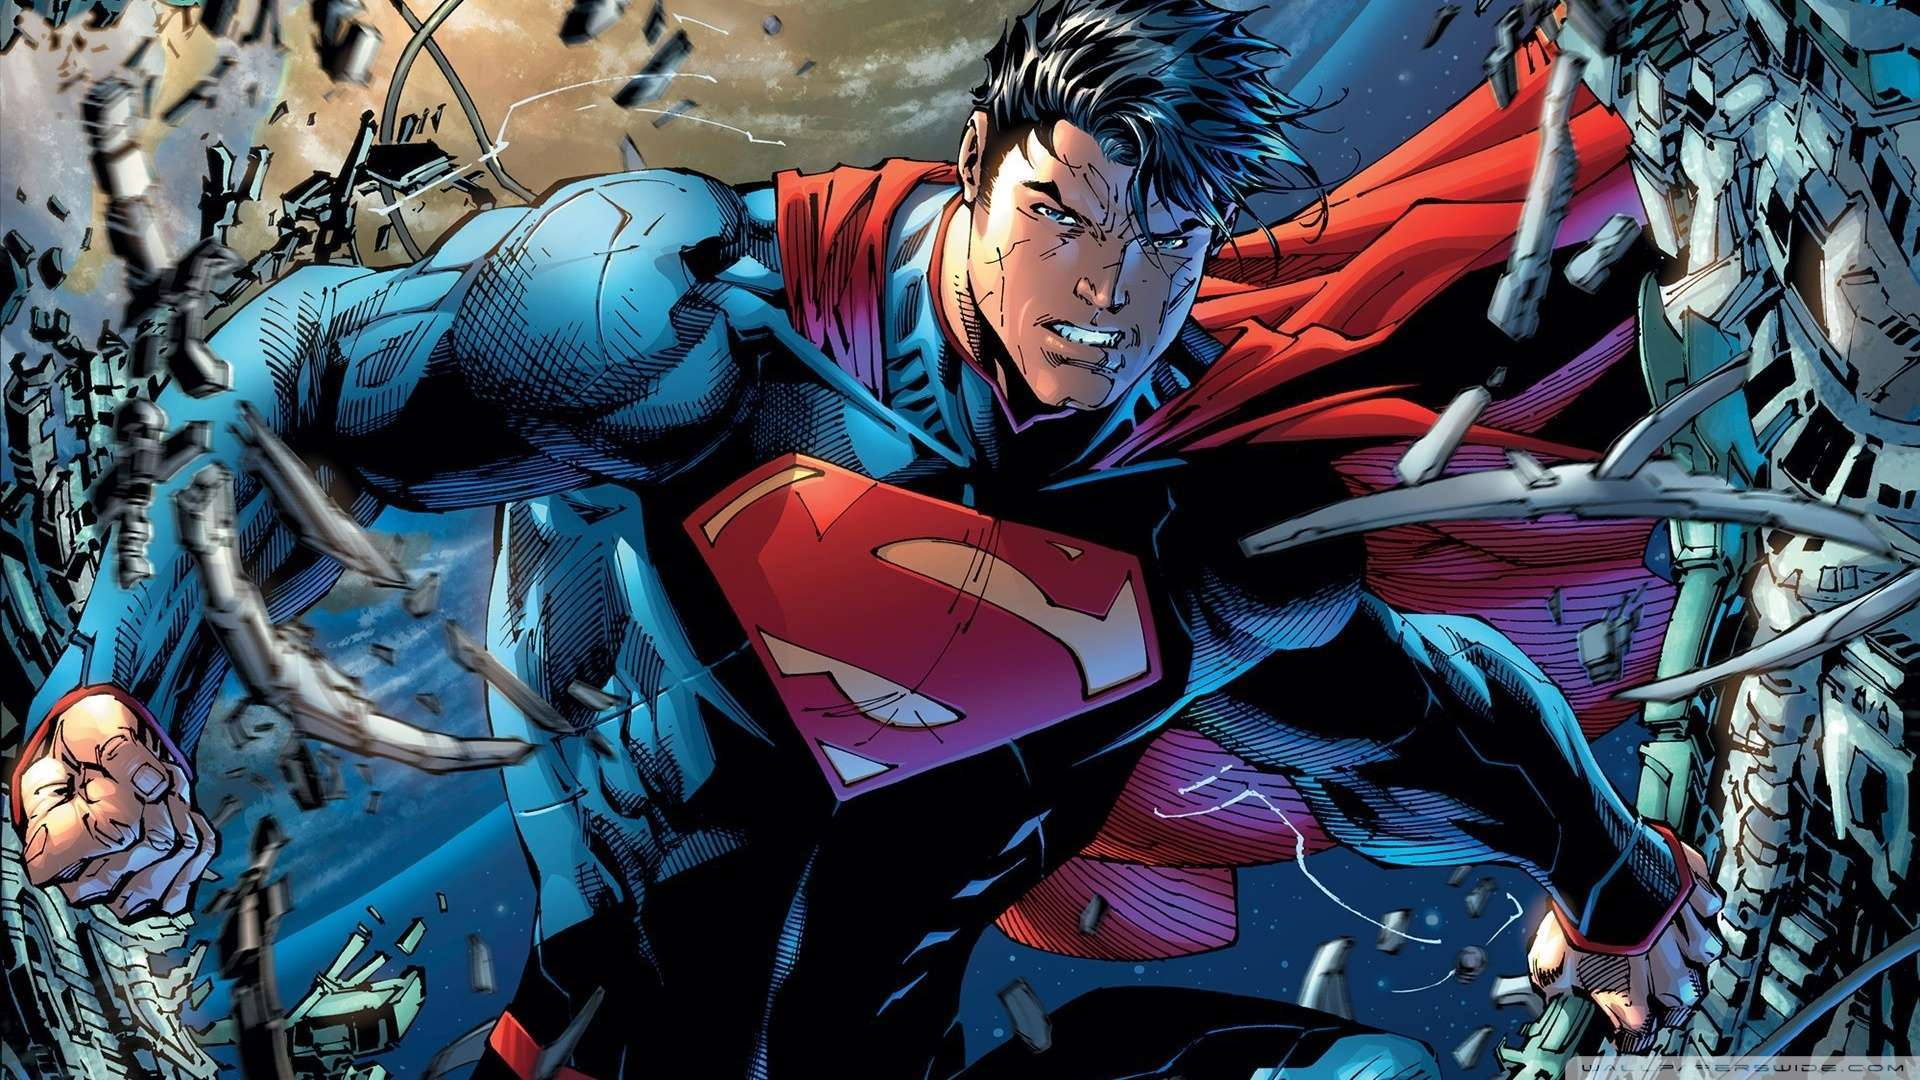 Wallpaper Superman Cartoon 2 Wallpaper 1080p HD Upload at January 2 1920x1080